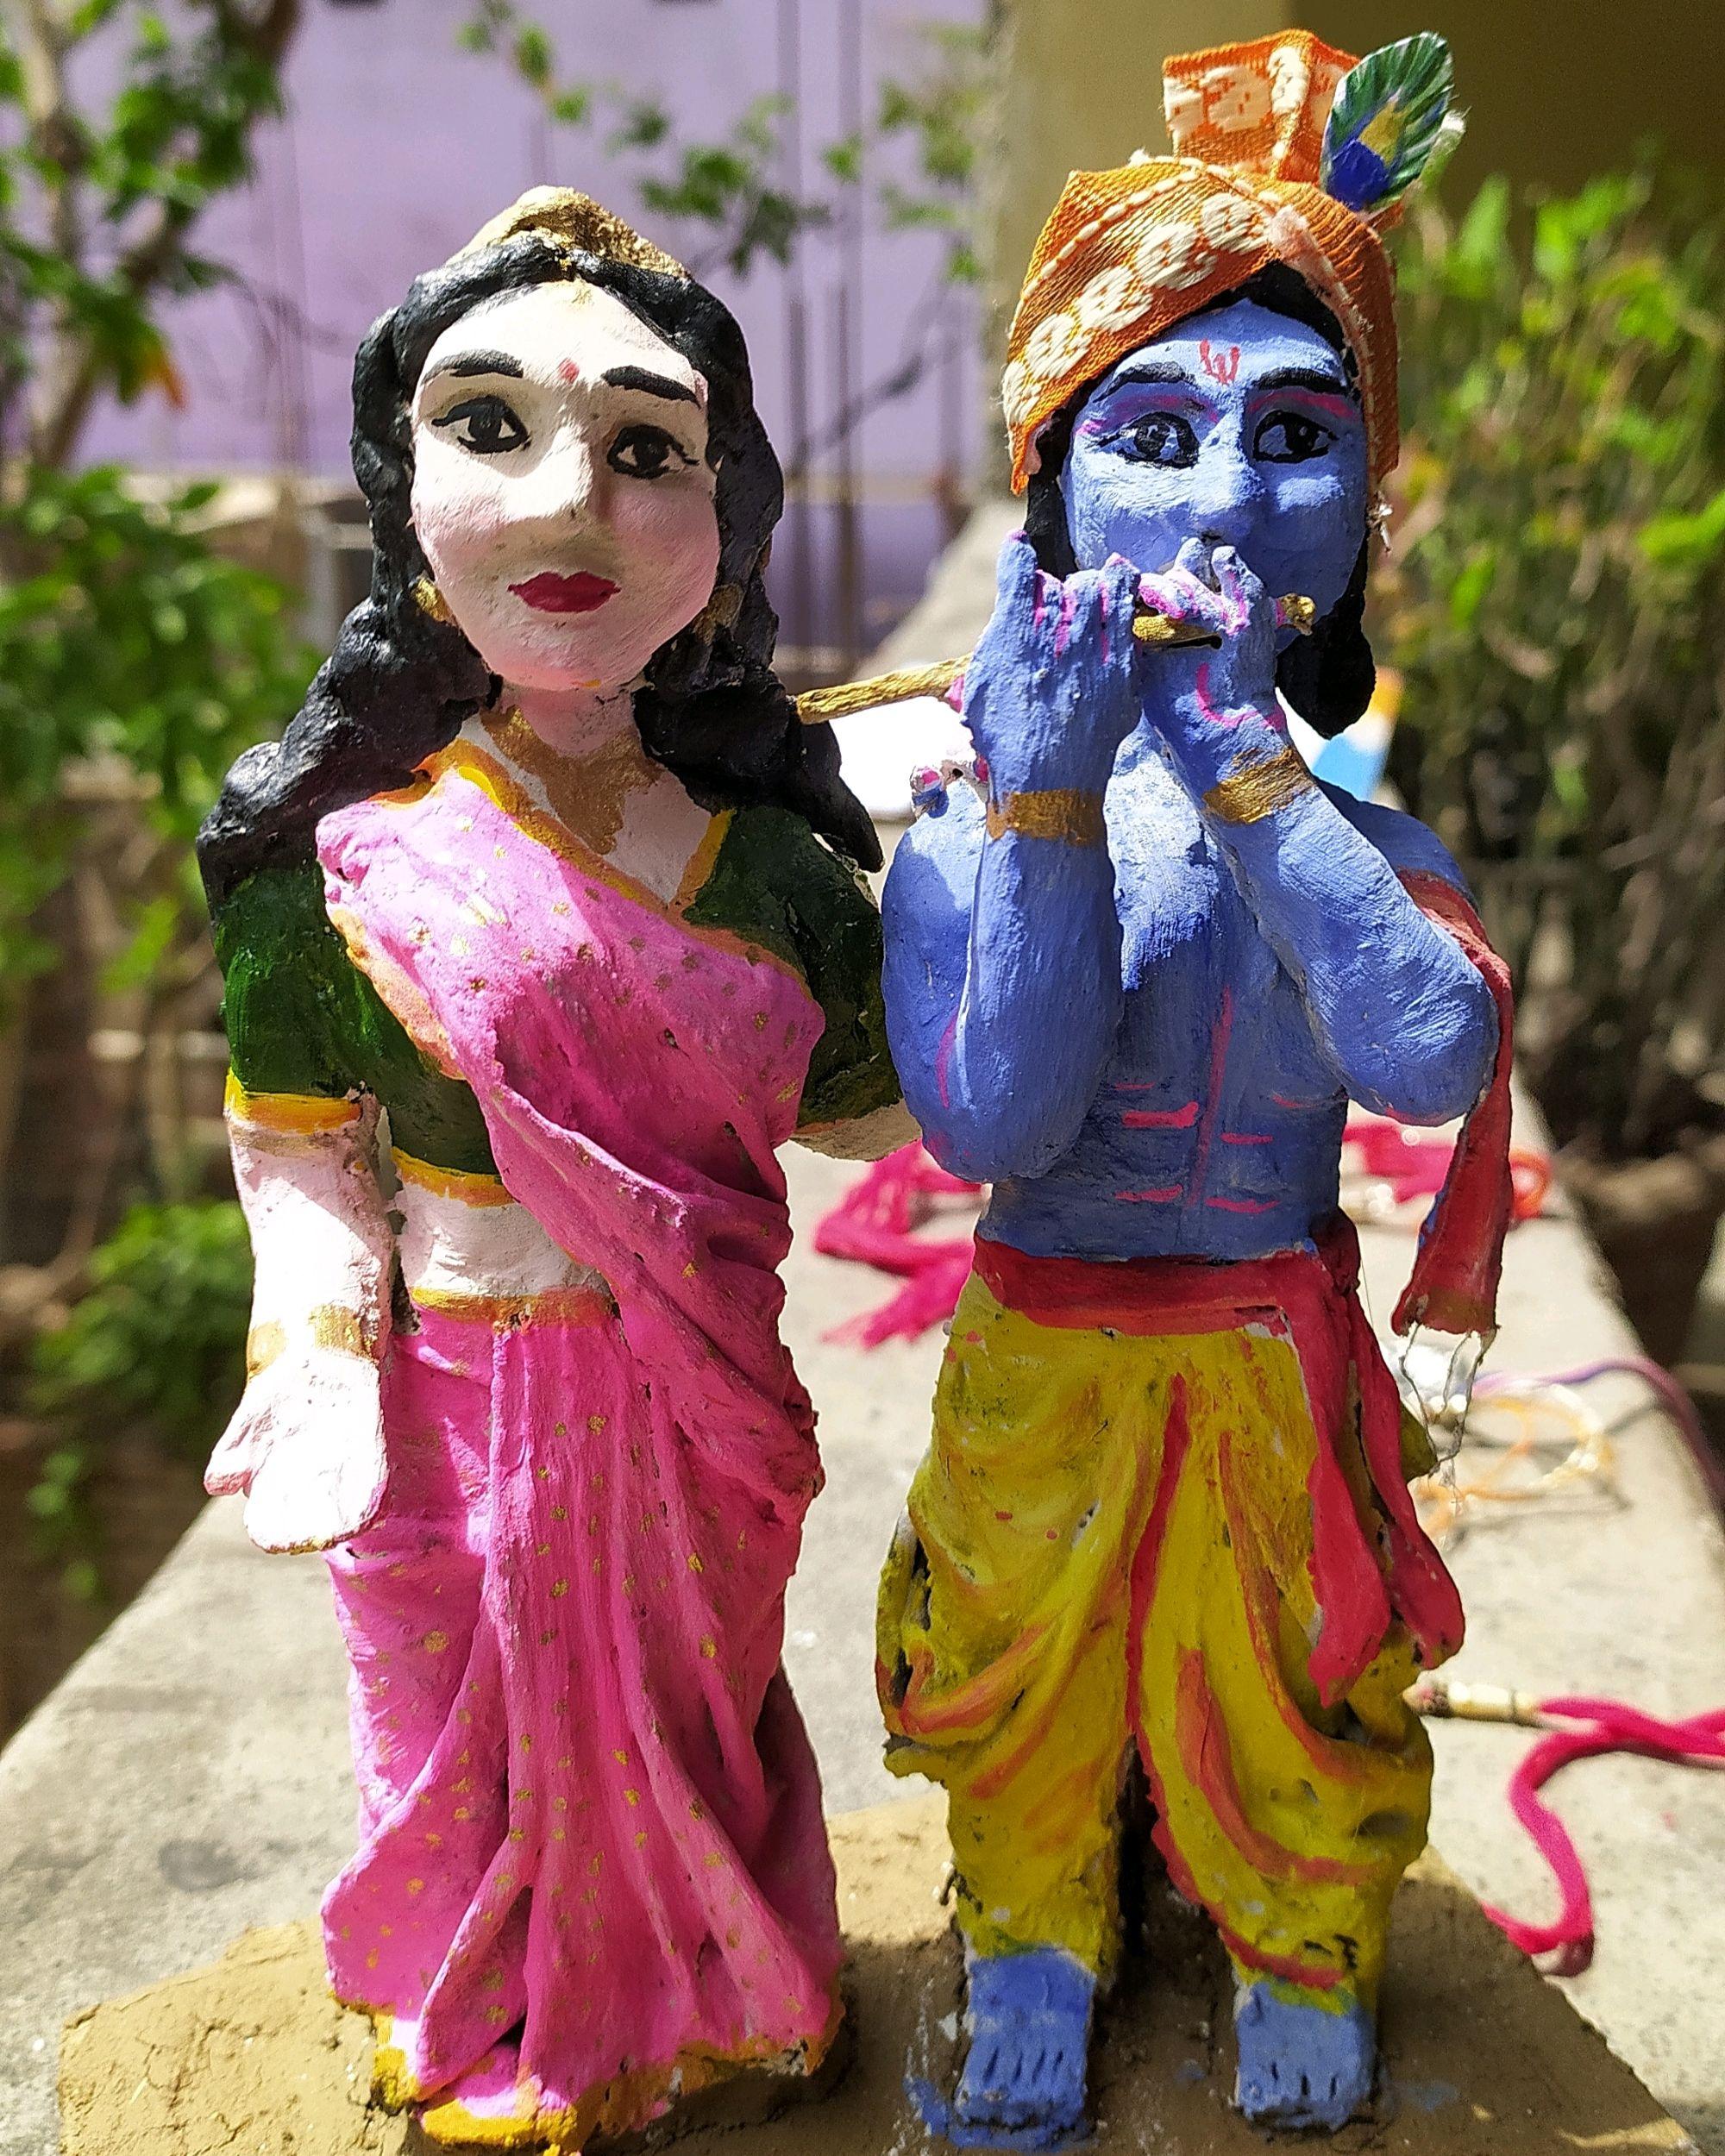 Uploaded by @gouravkumar05